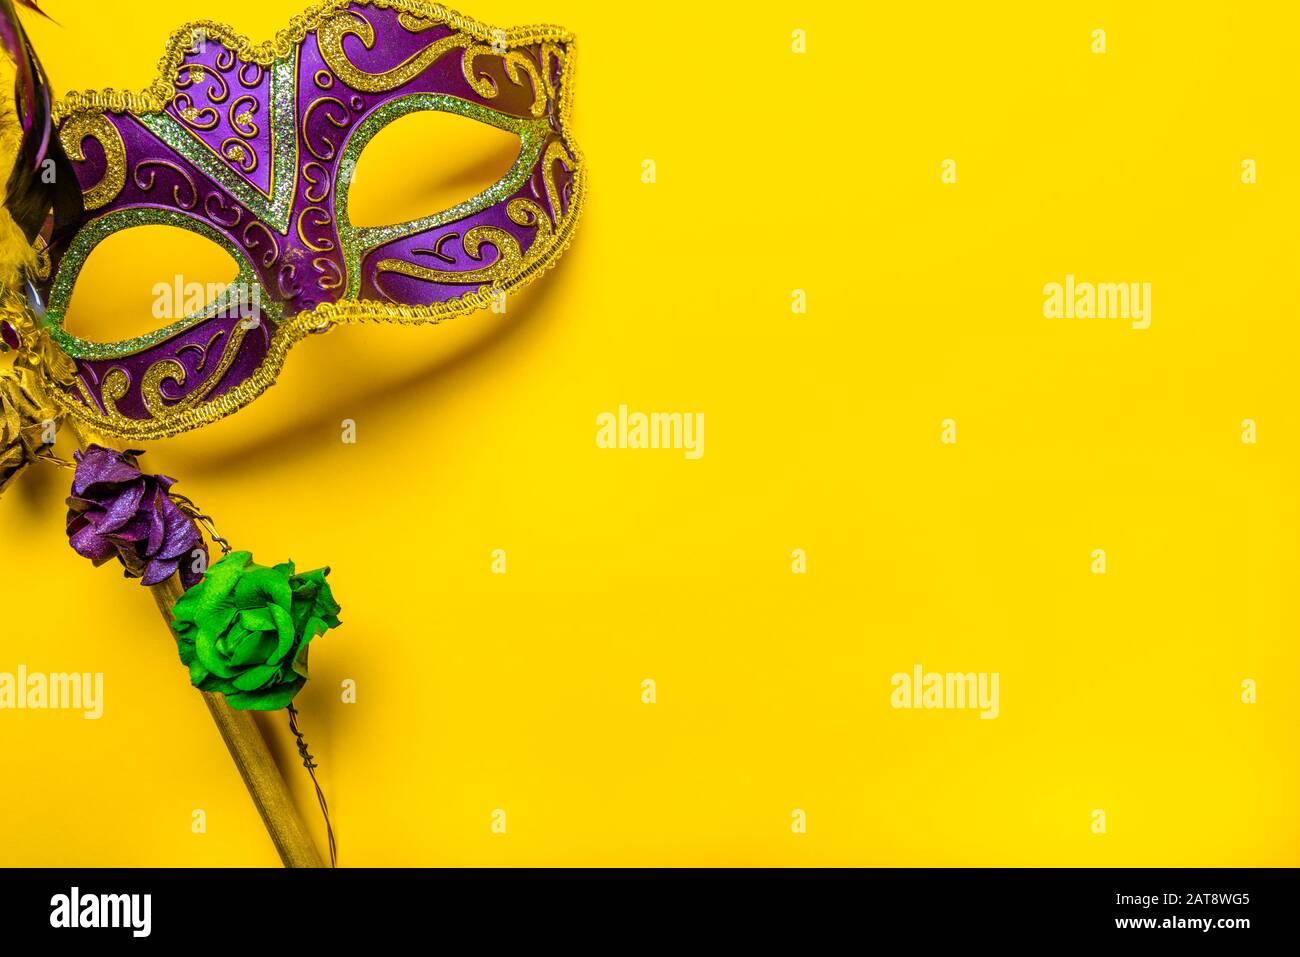 Mardi Gras mask on a bright yellow background Stock Photo